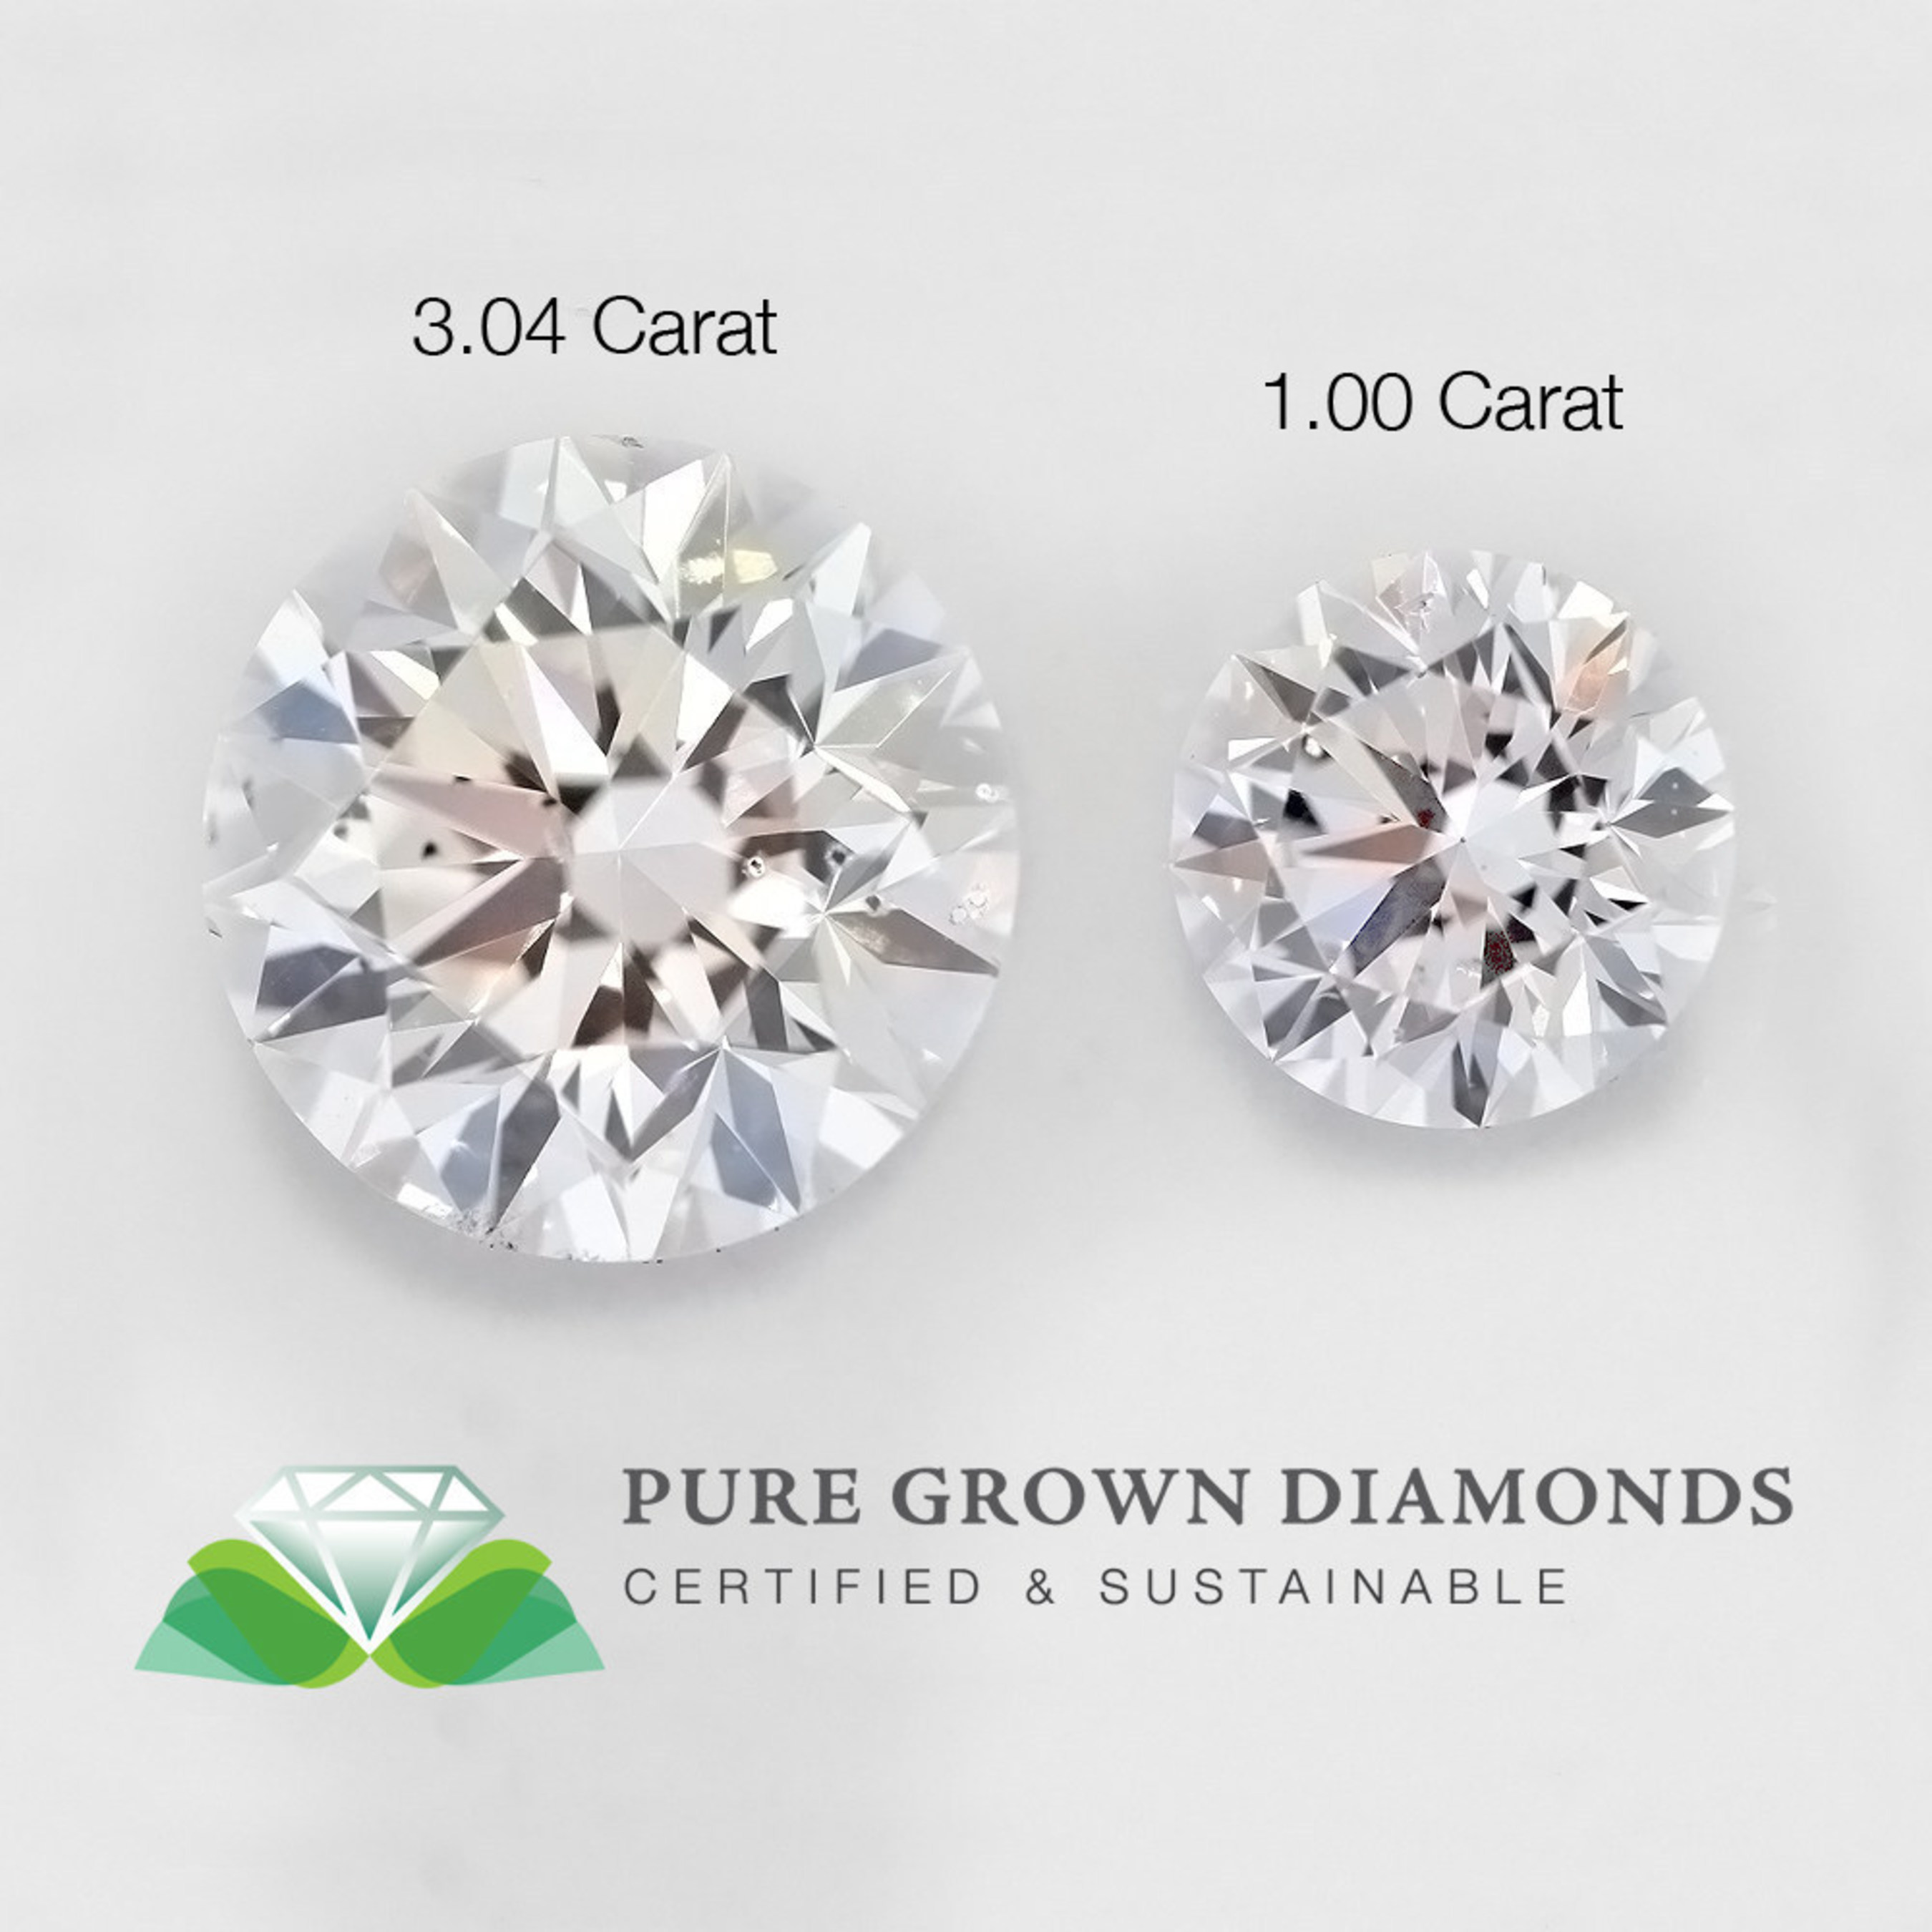 Pure Grown Diamonds Unveils World's Largest on NBC News ...